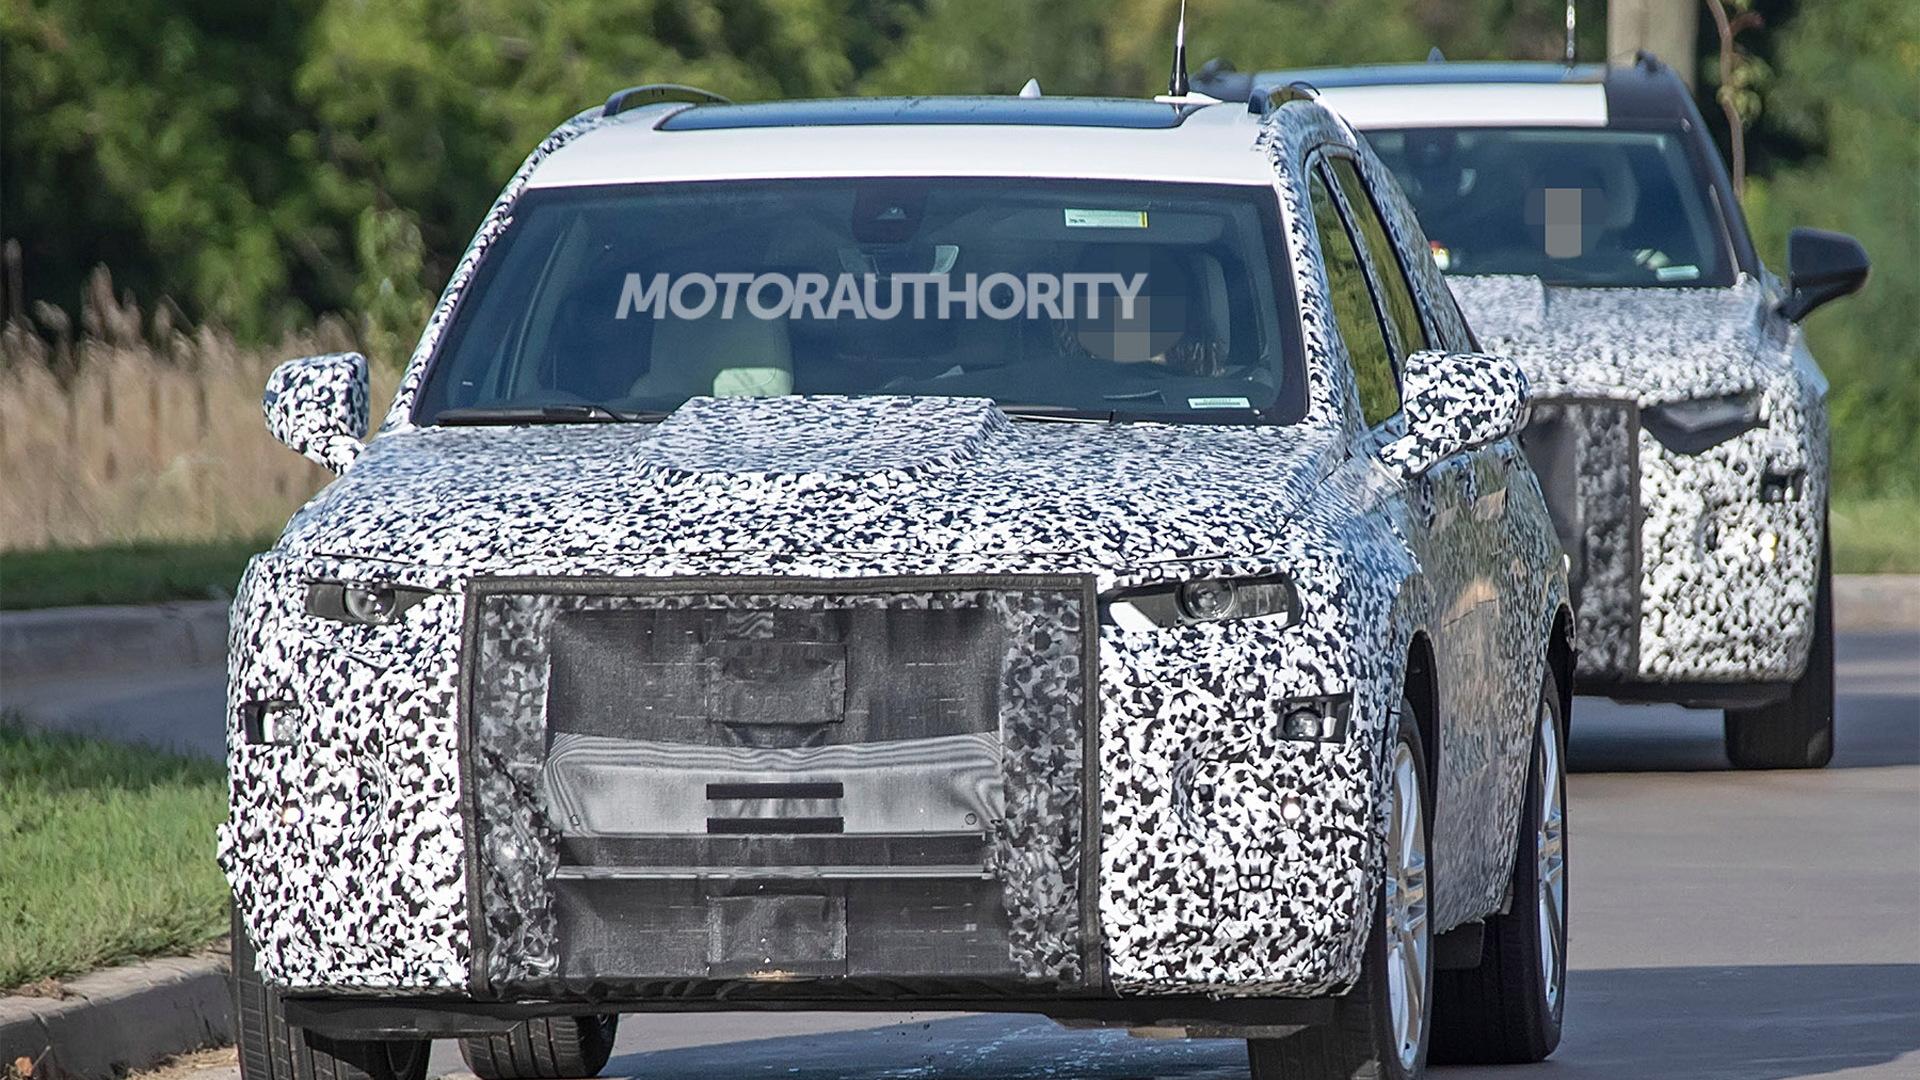 2020 Cadillac XT6 spy shots - Image via S. Baldauf/SB-Medien